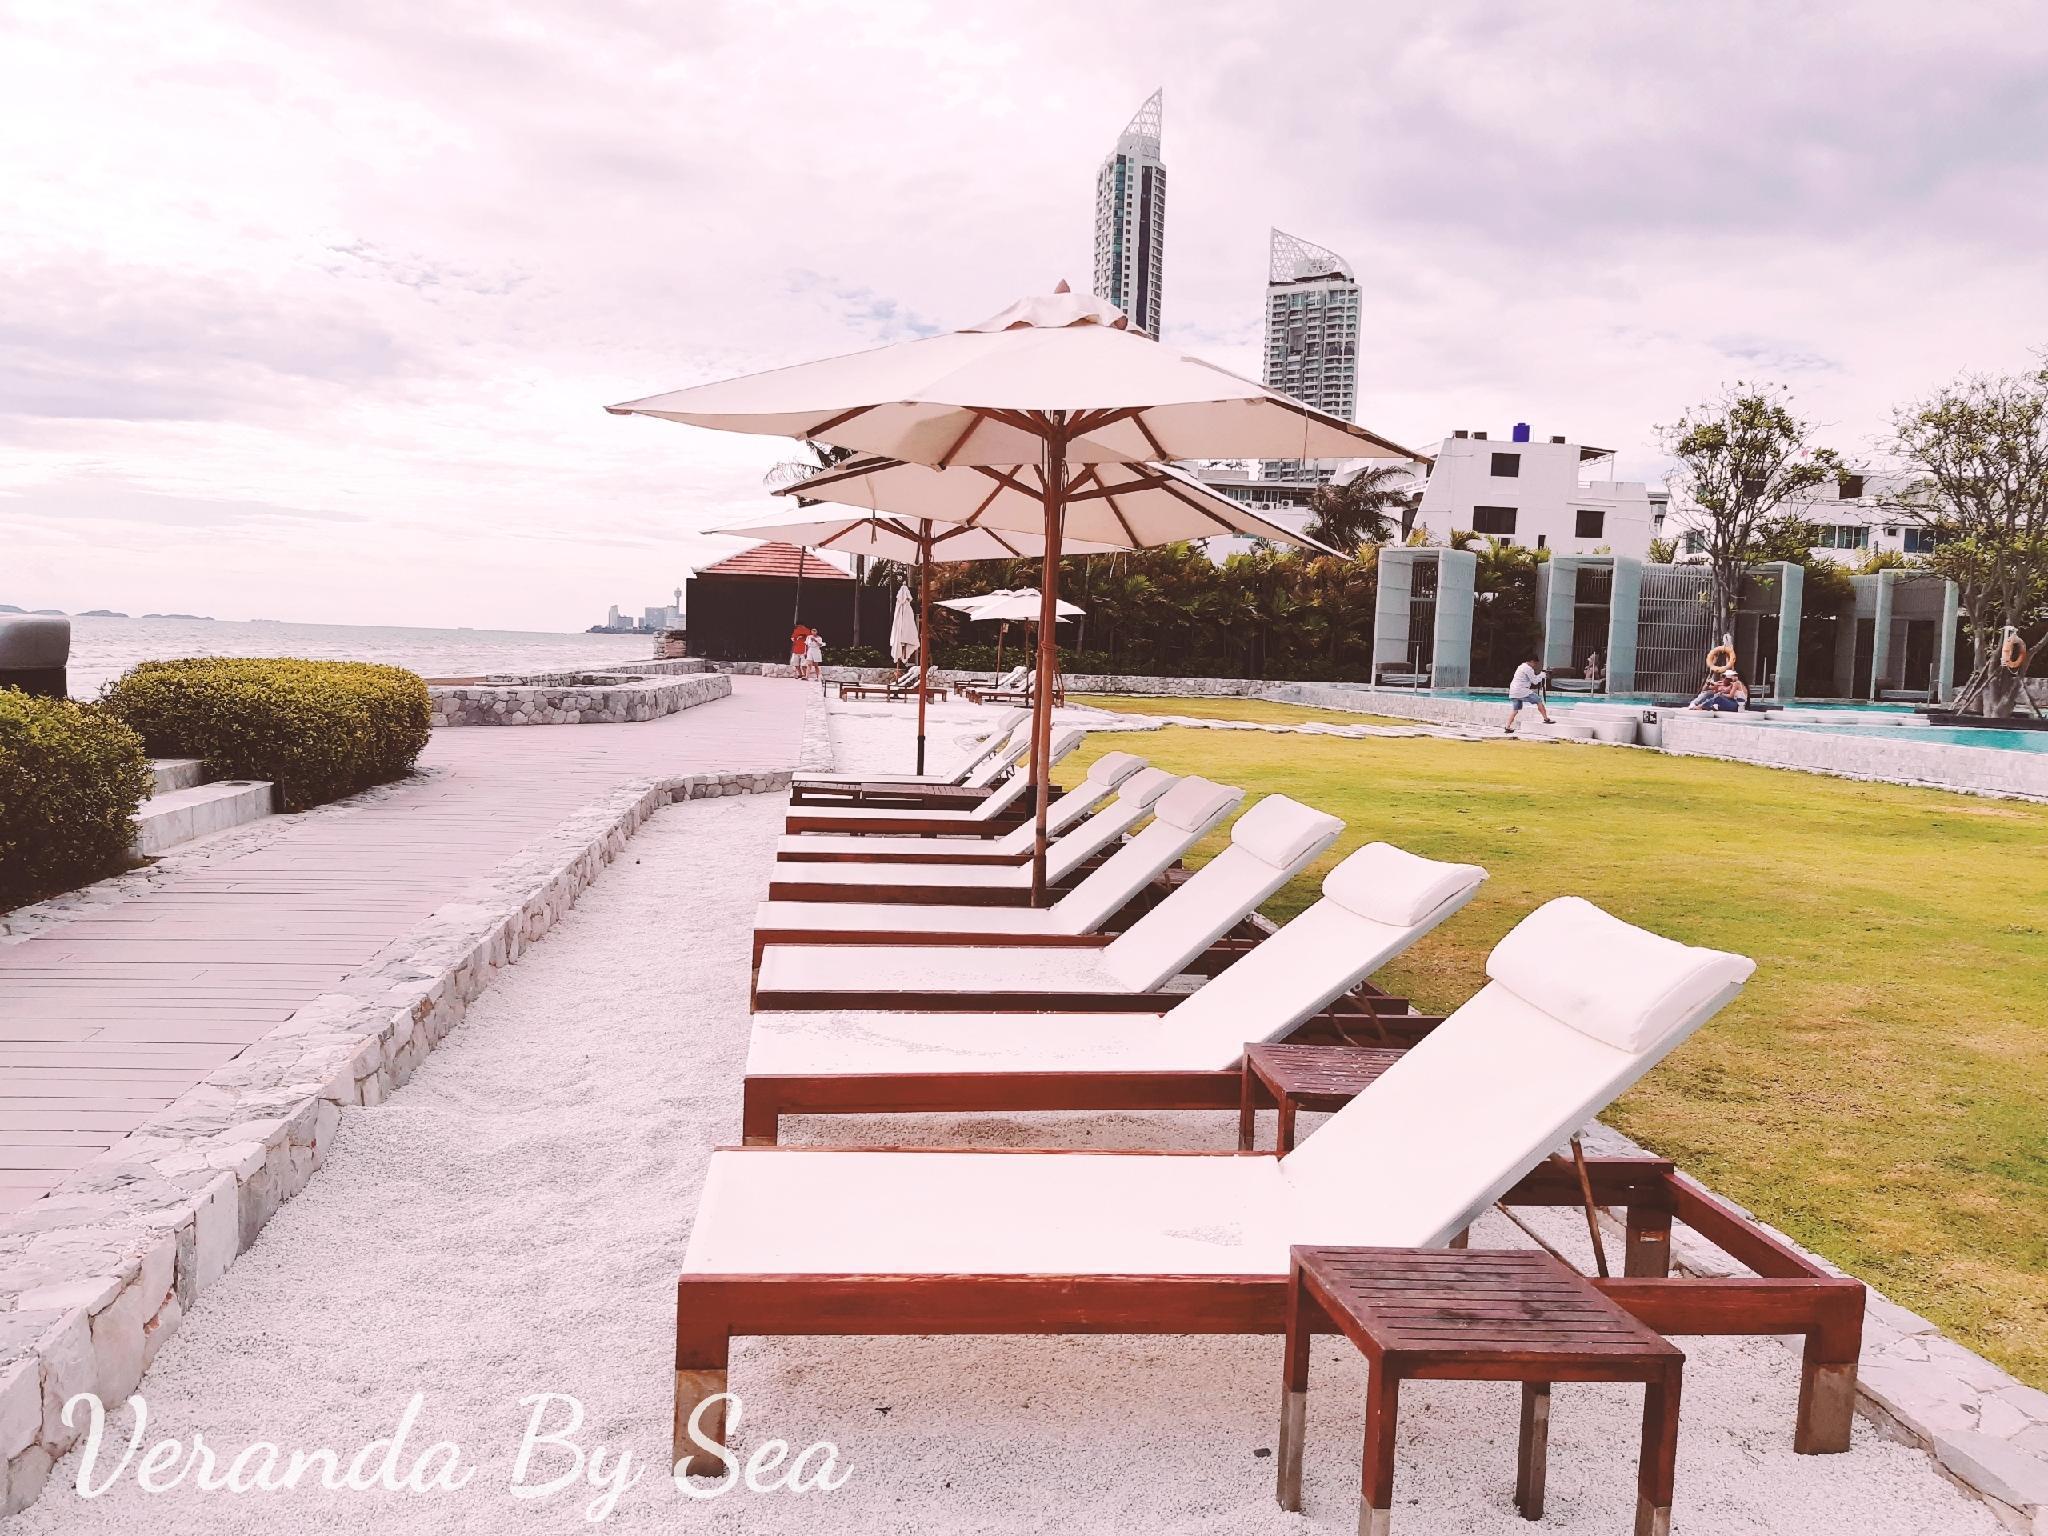 veranda residence pattaya by sea อพาร์ตเมนต์ 1 ห้องนอน 1 ห้องน้ำส่วนตัว ขนาด 35 ตร.ม. – นาจอมเทียน